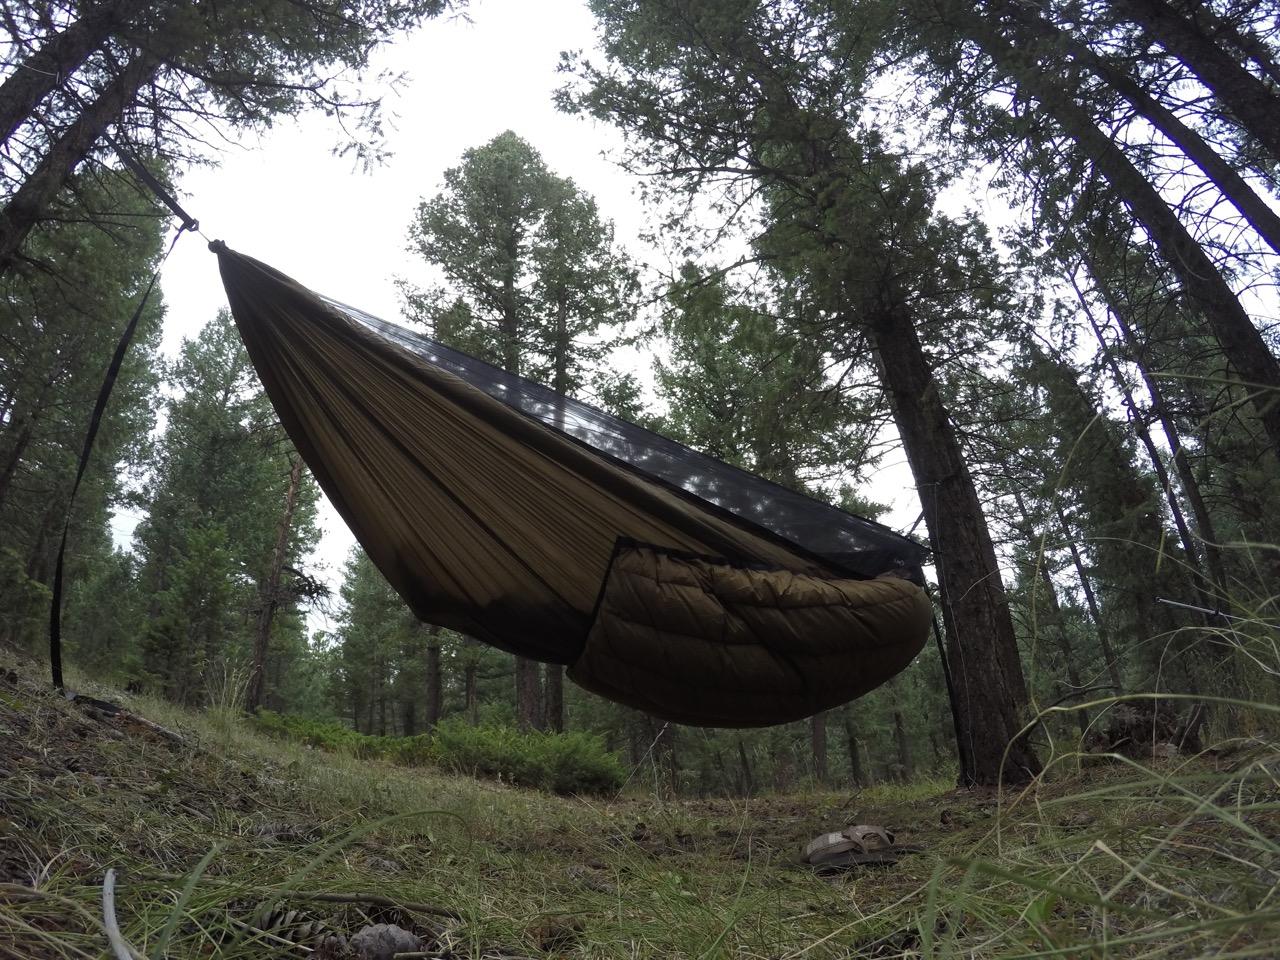 brown yeti underquilt on blackbird xlc hammock yeti underquilts for wilderness hammocks  rh   warbon outdoors